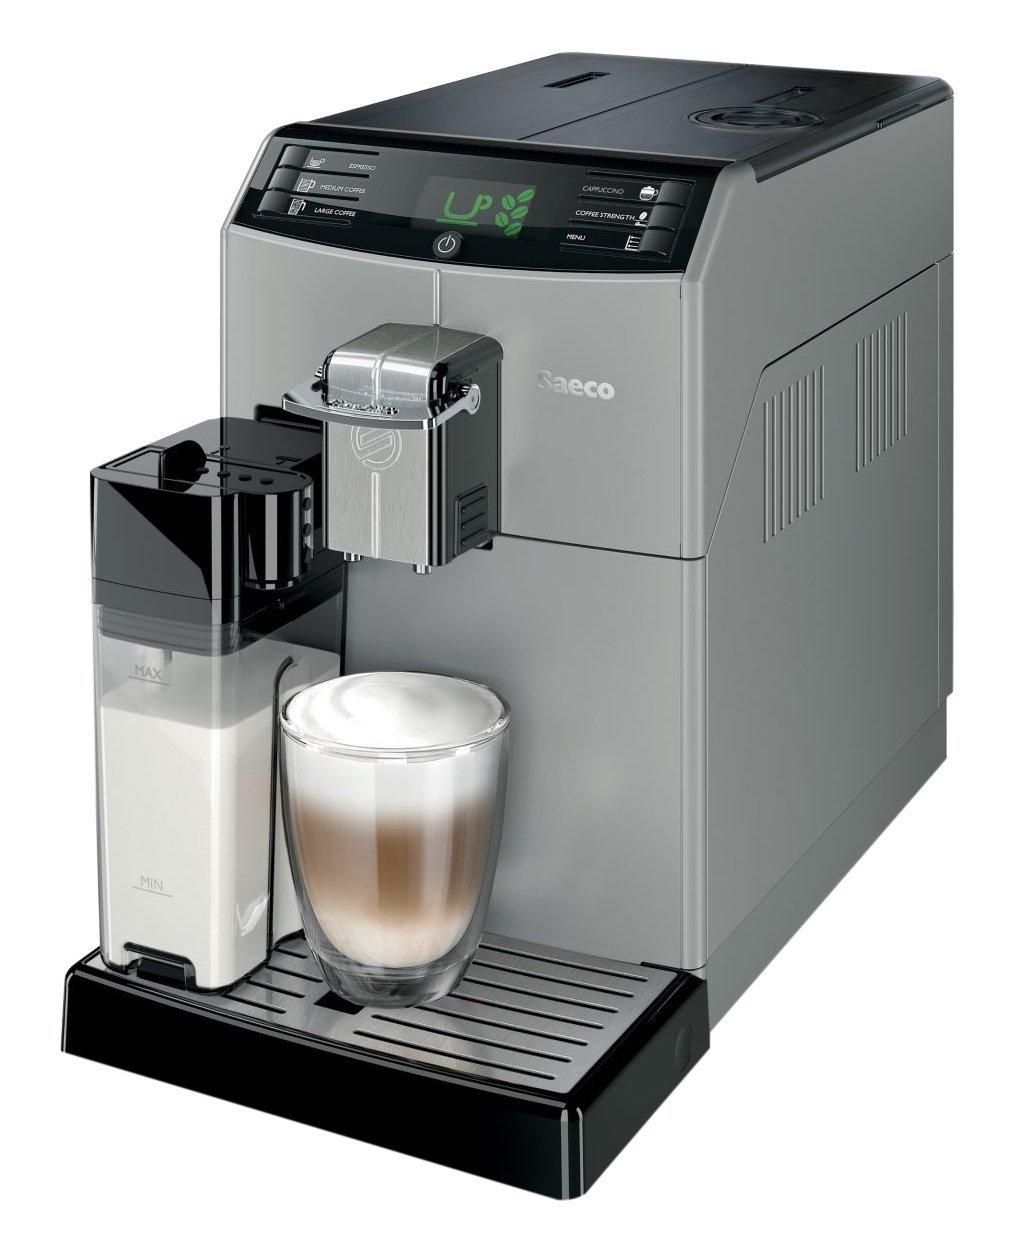 Saeco-Minuto-espresso-machine